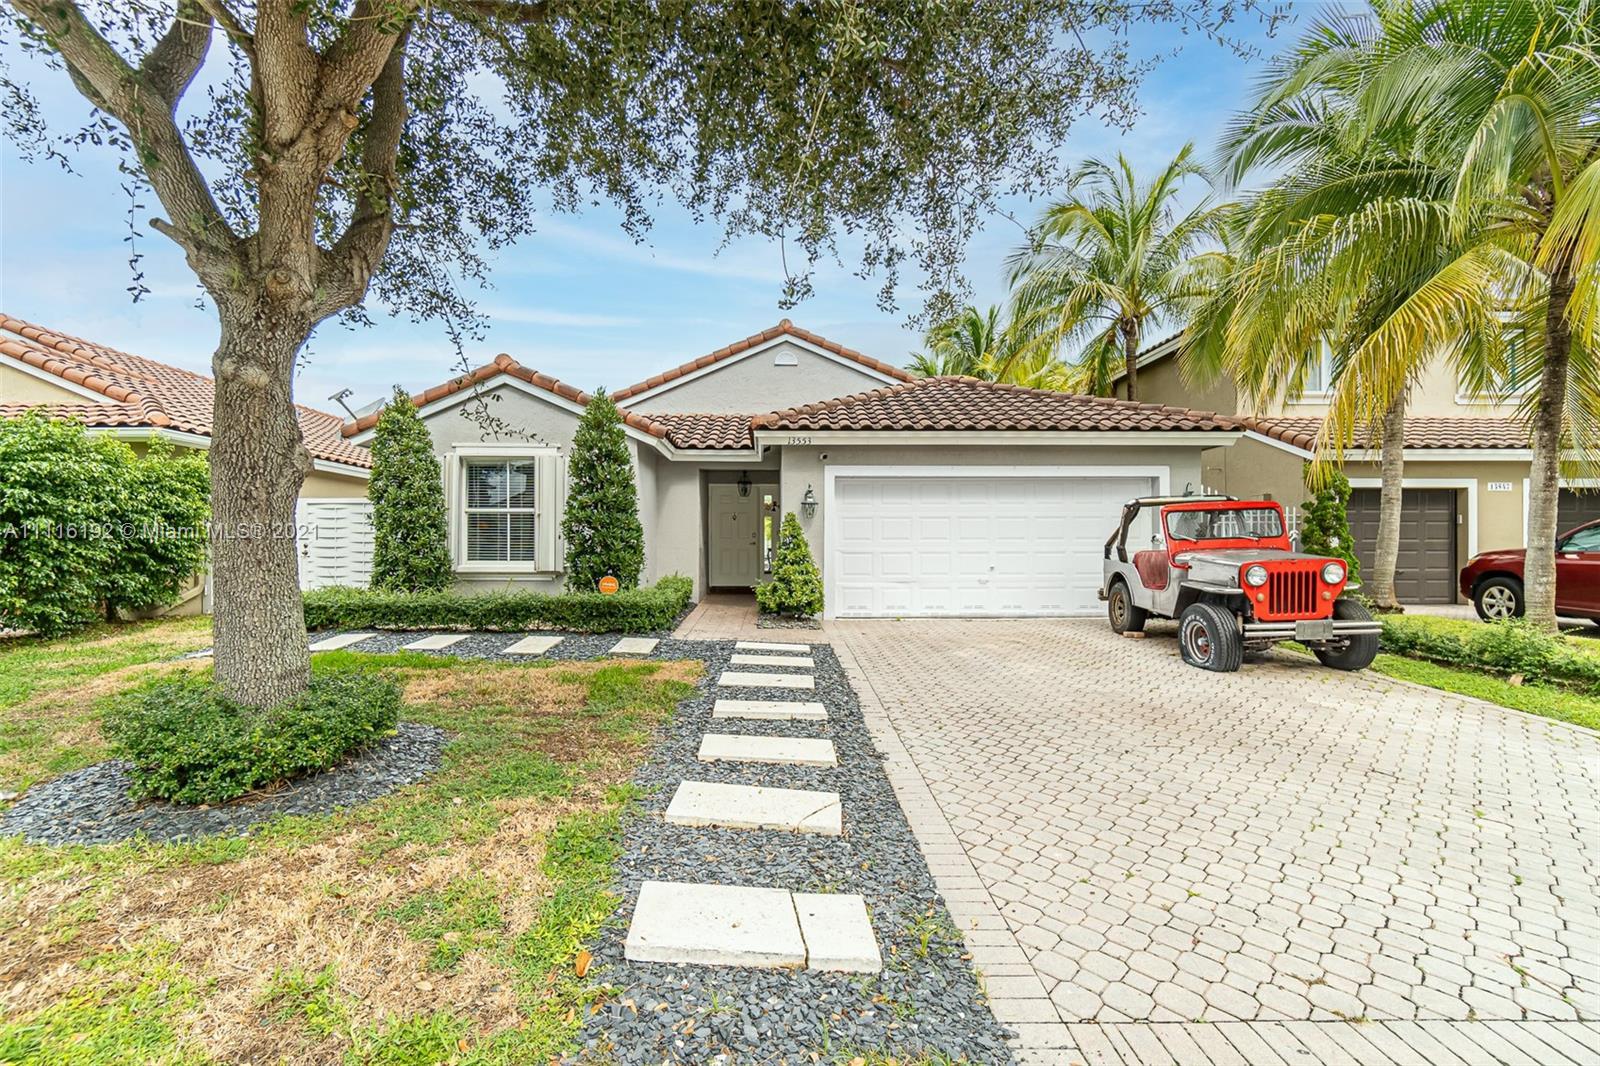 Single Family Home,For Sale,13553 SW 144th Ter, Miami, Florida 33186,Brickell,realty,broker,condos near me